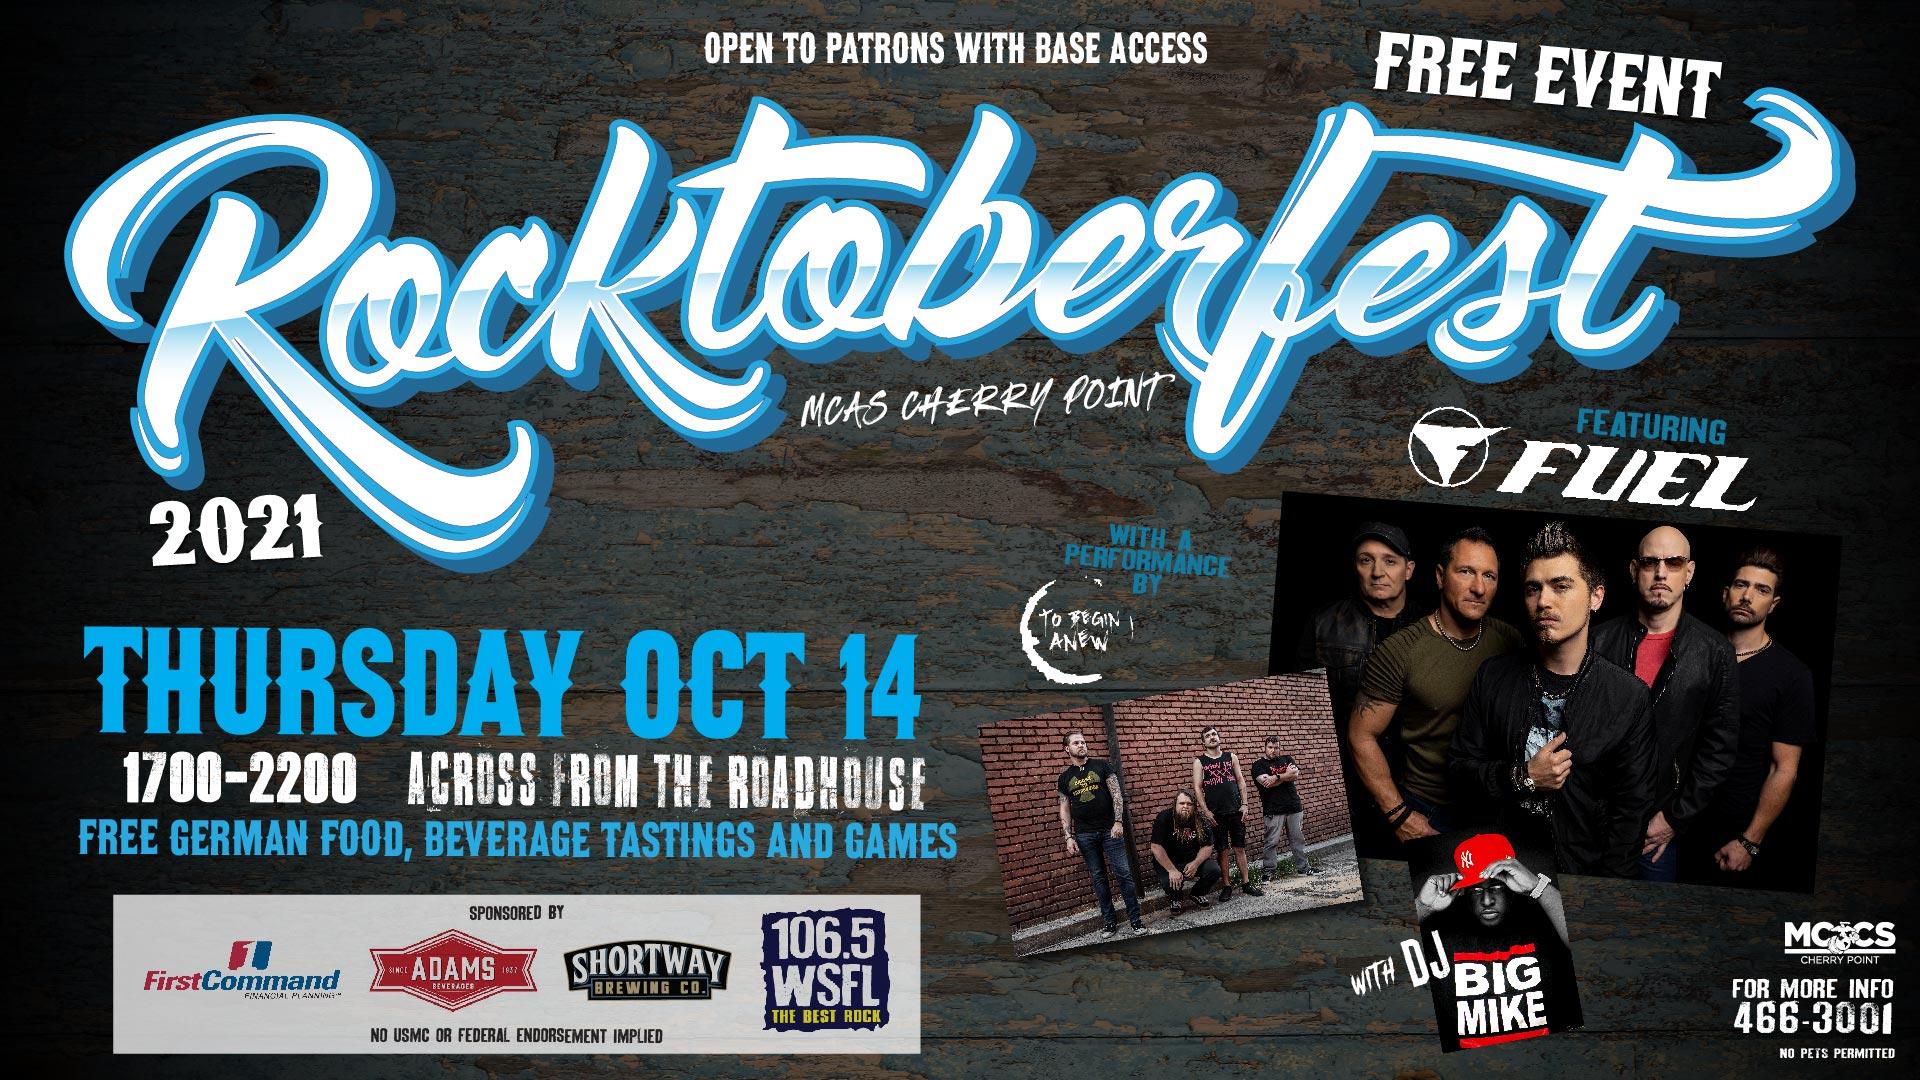 WSFL Presents Rocktoberfest@ MCAS Cherry Point